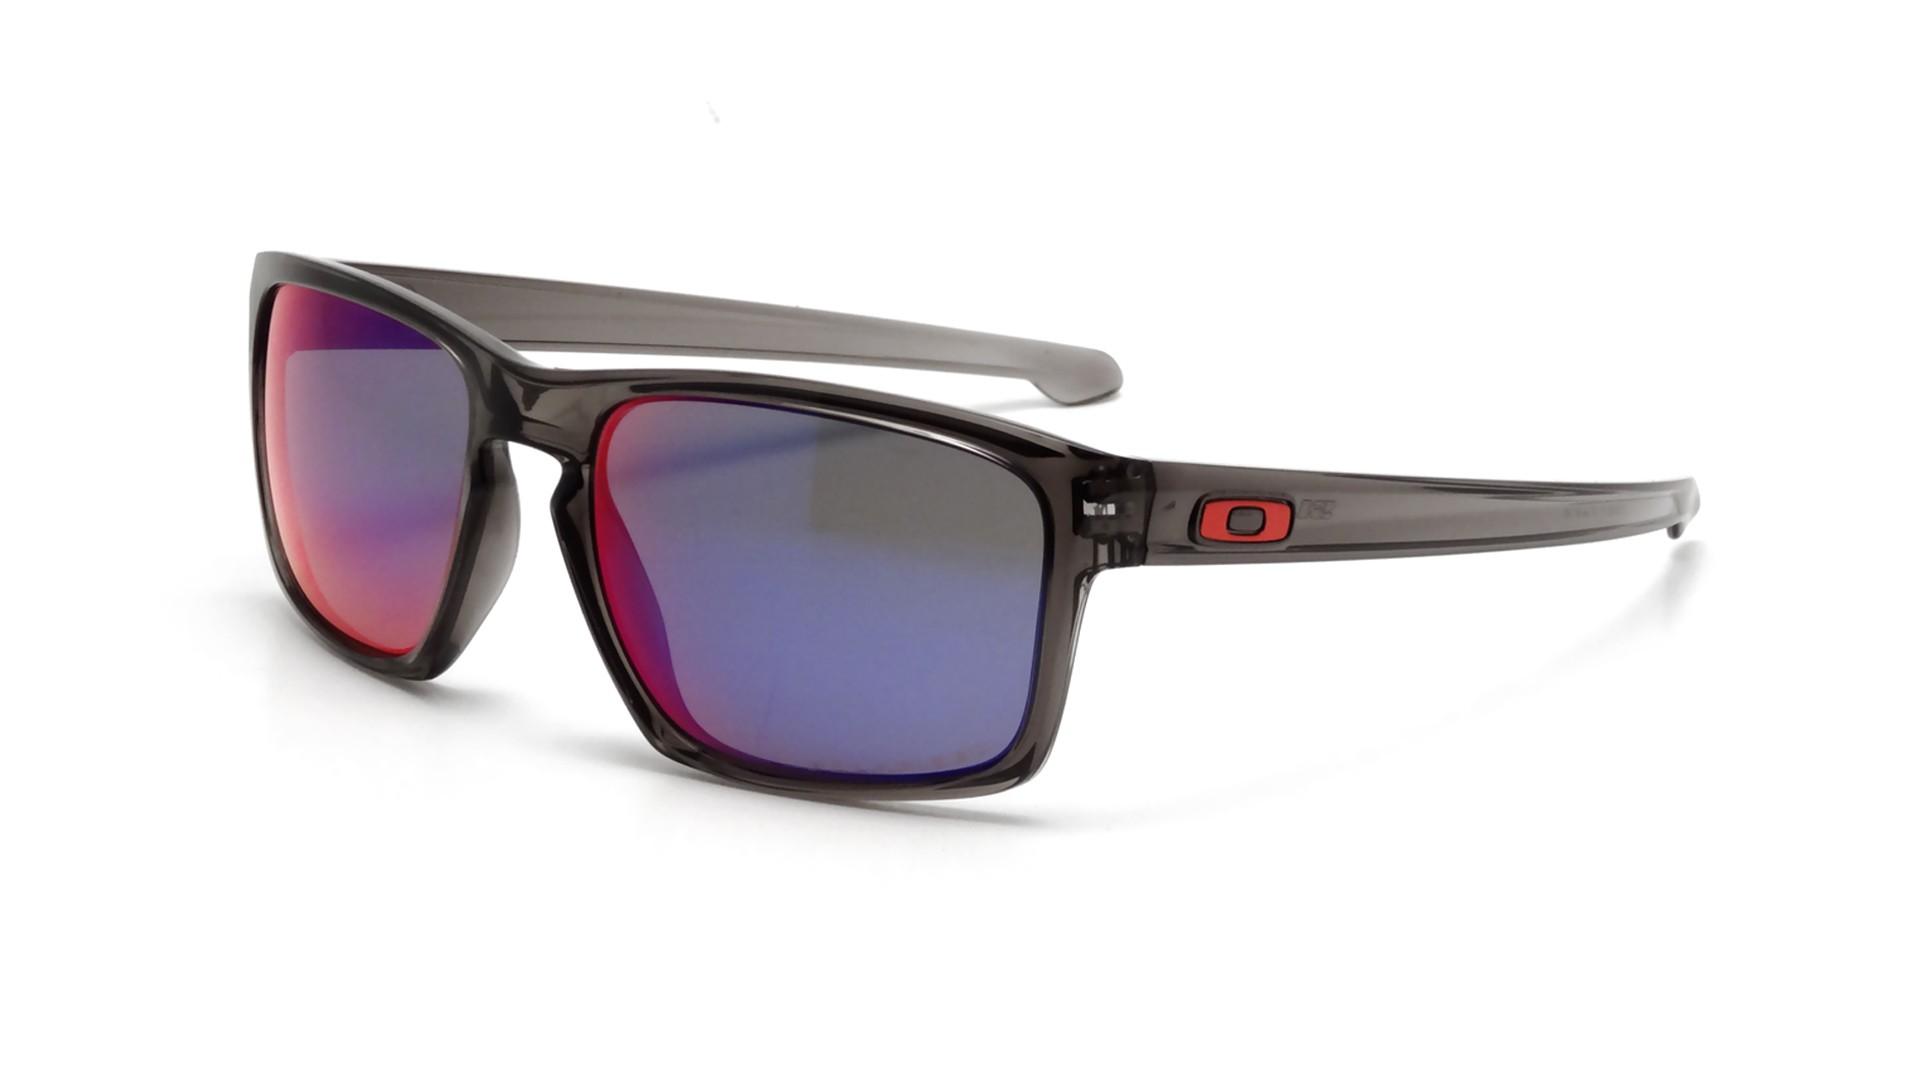 Grey Polarized Sunglasses  sliver grey oo9262 11 57 18 polarized visiofactory